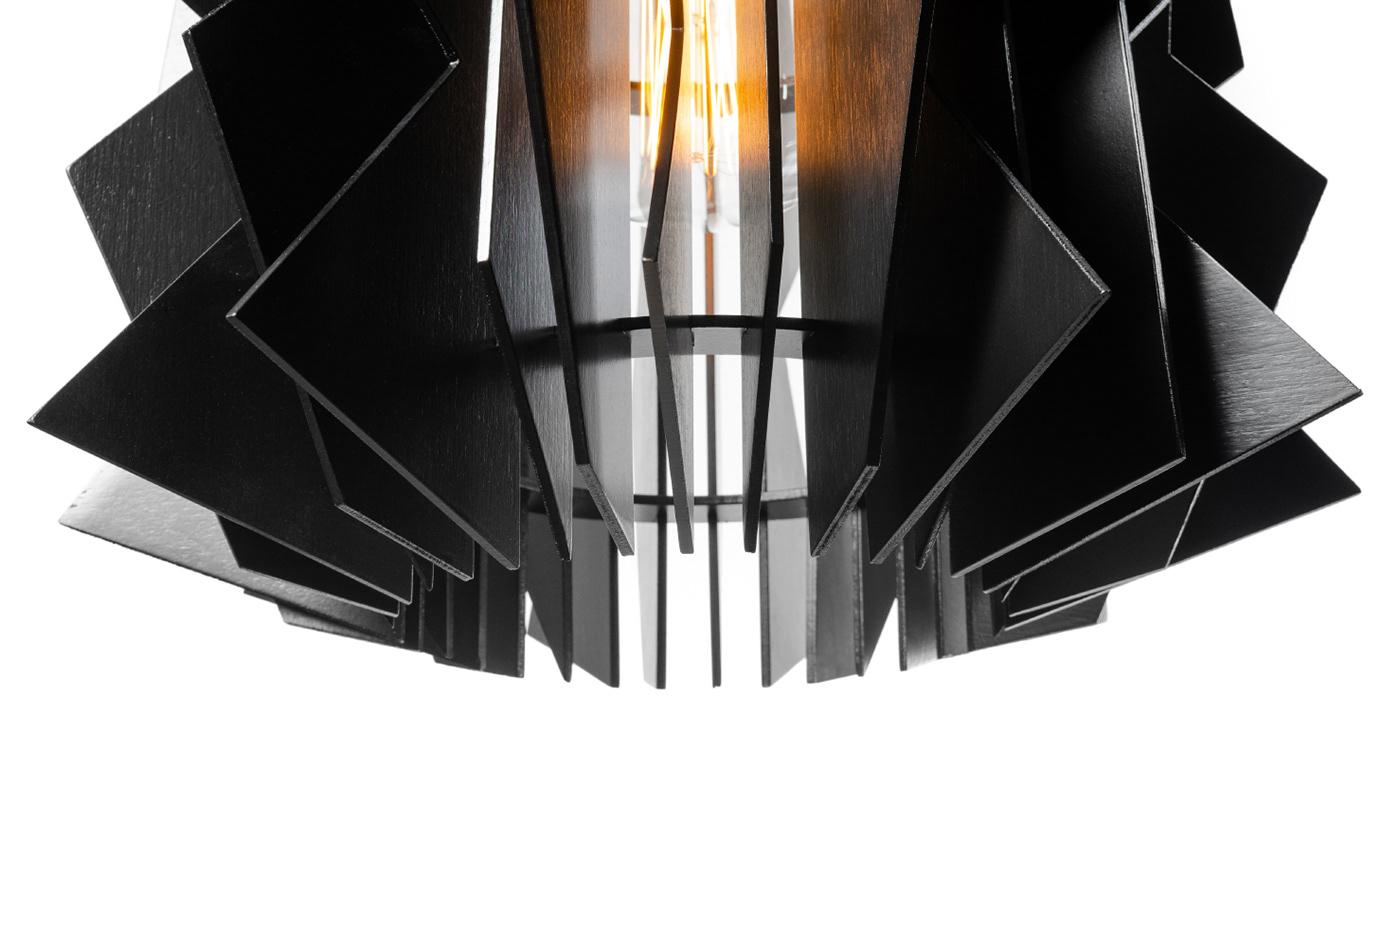 Lamp lamps poland plywood pendant pendant light floor lamp lighting illumination Światło